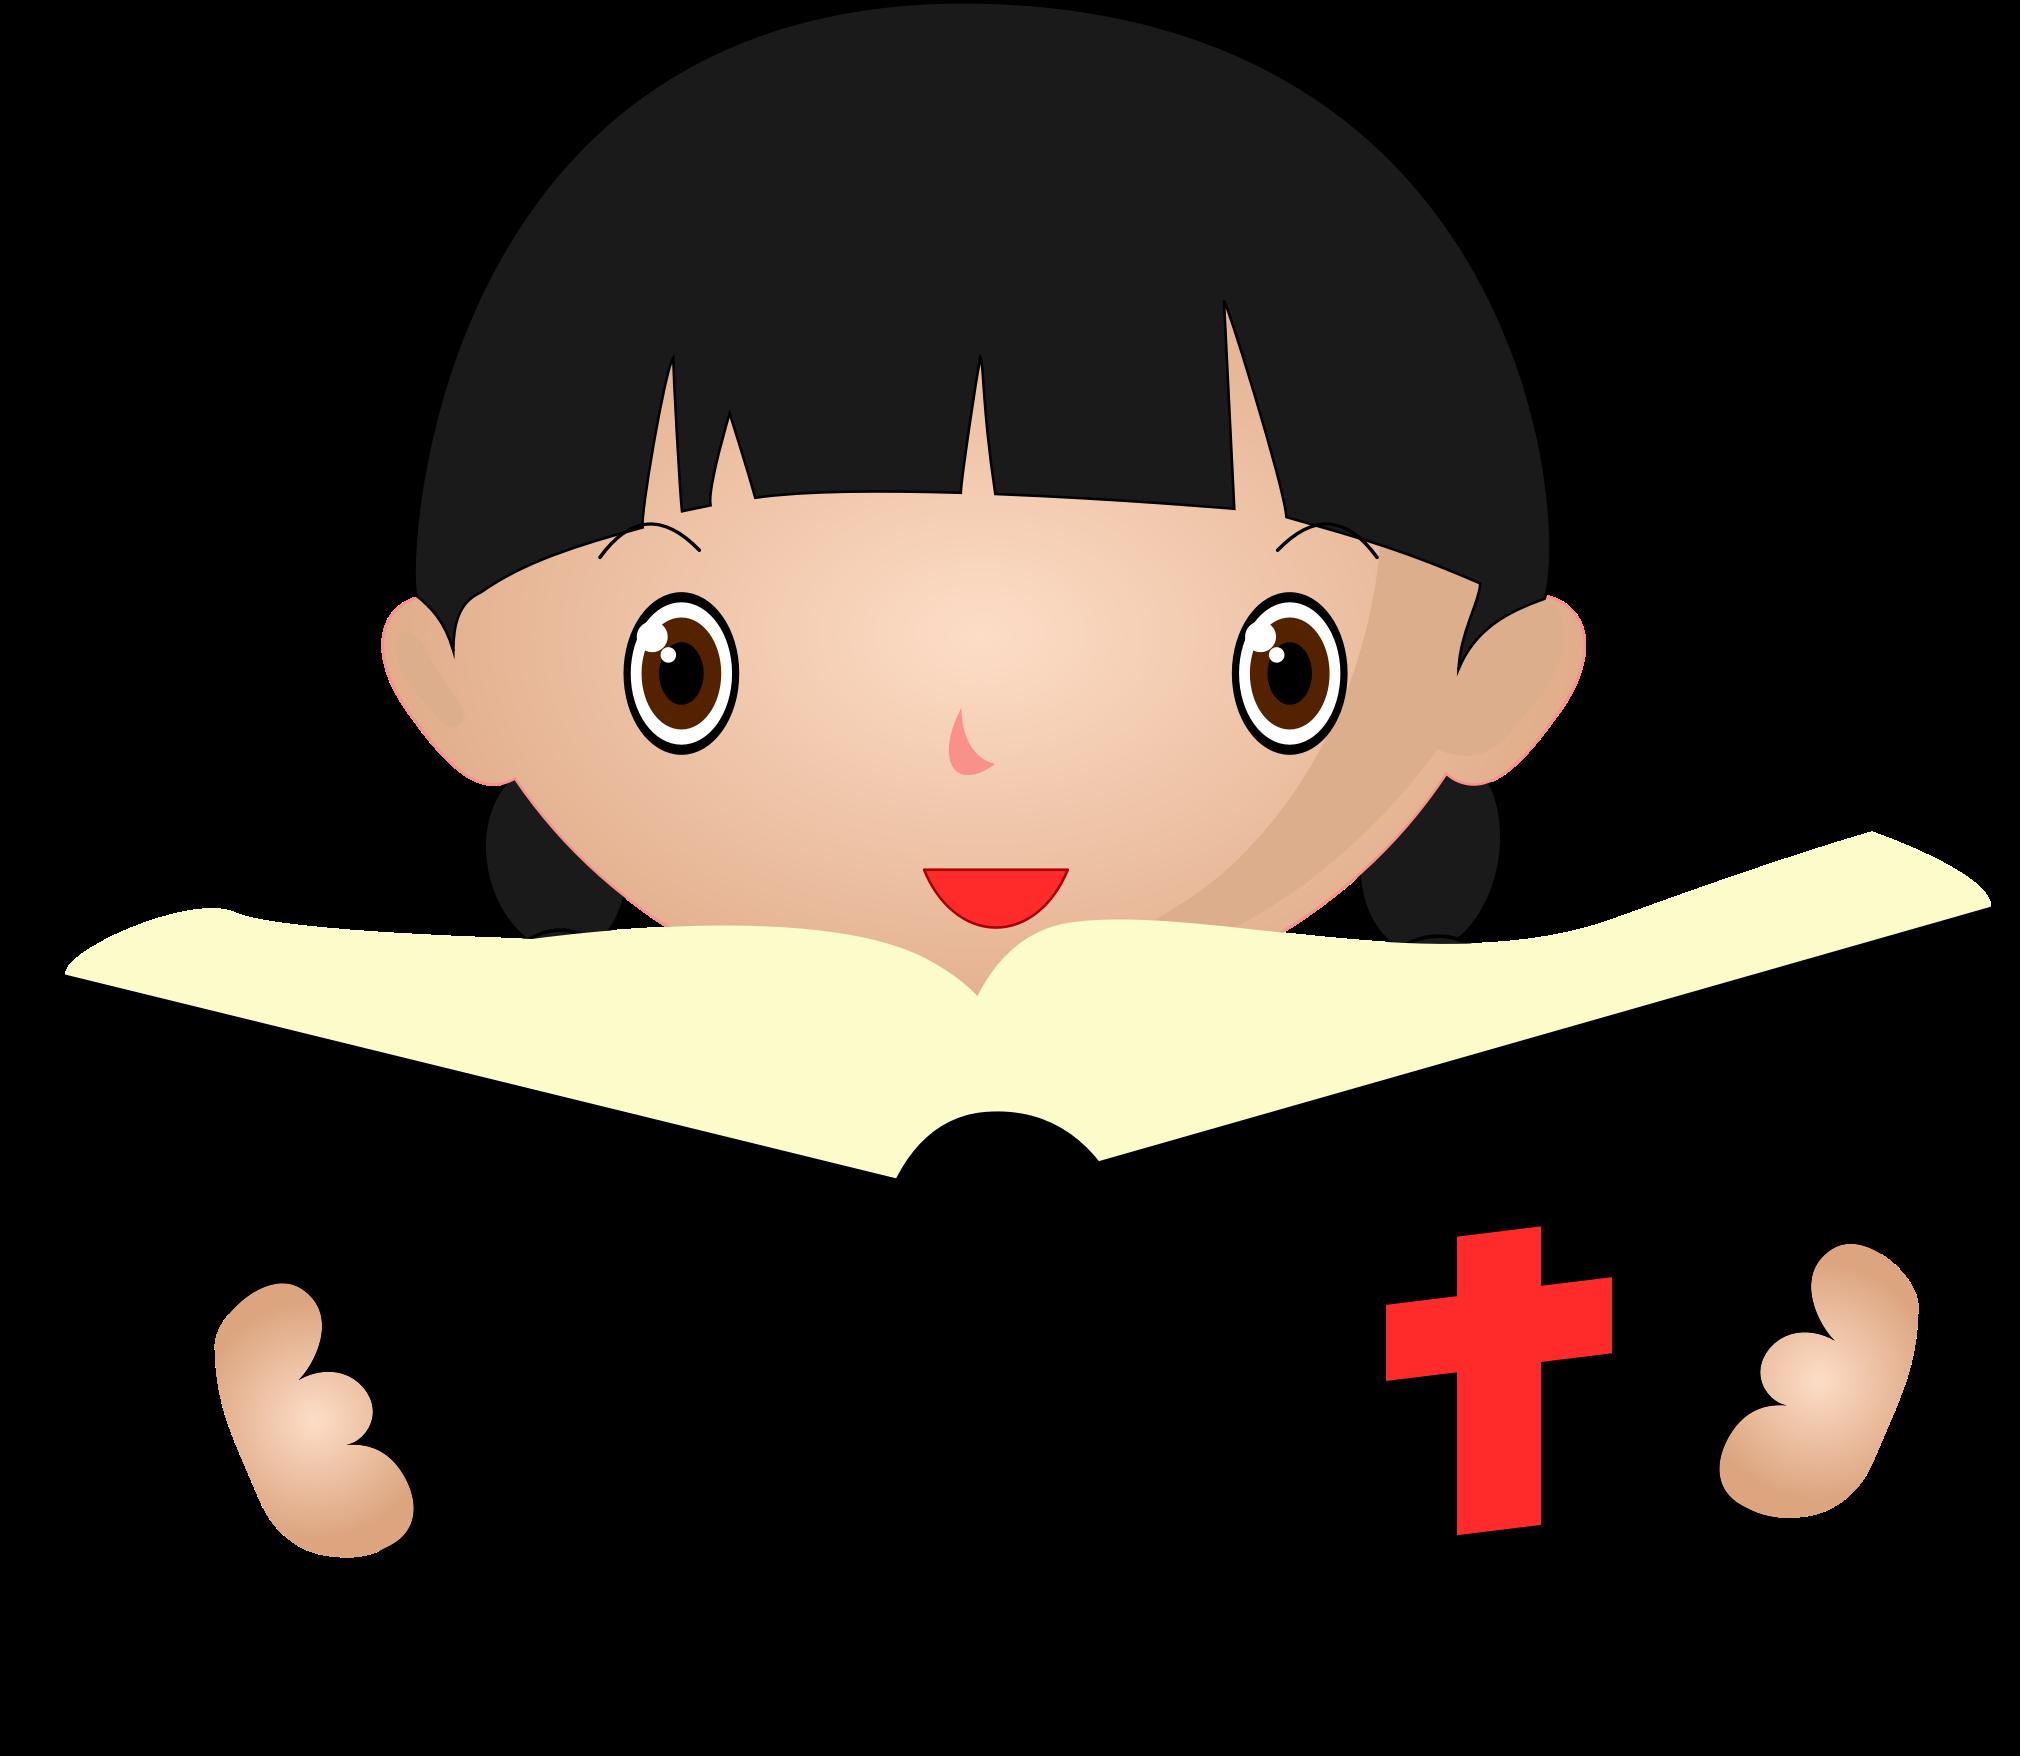 Clipart reading bible, Clipart reading bible Transparent.